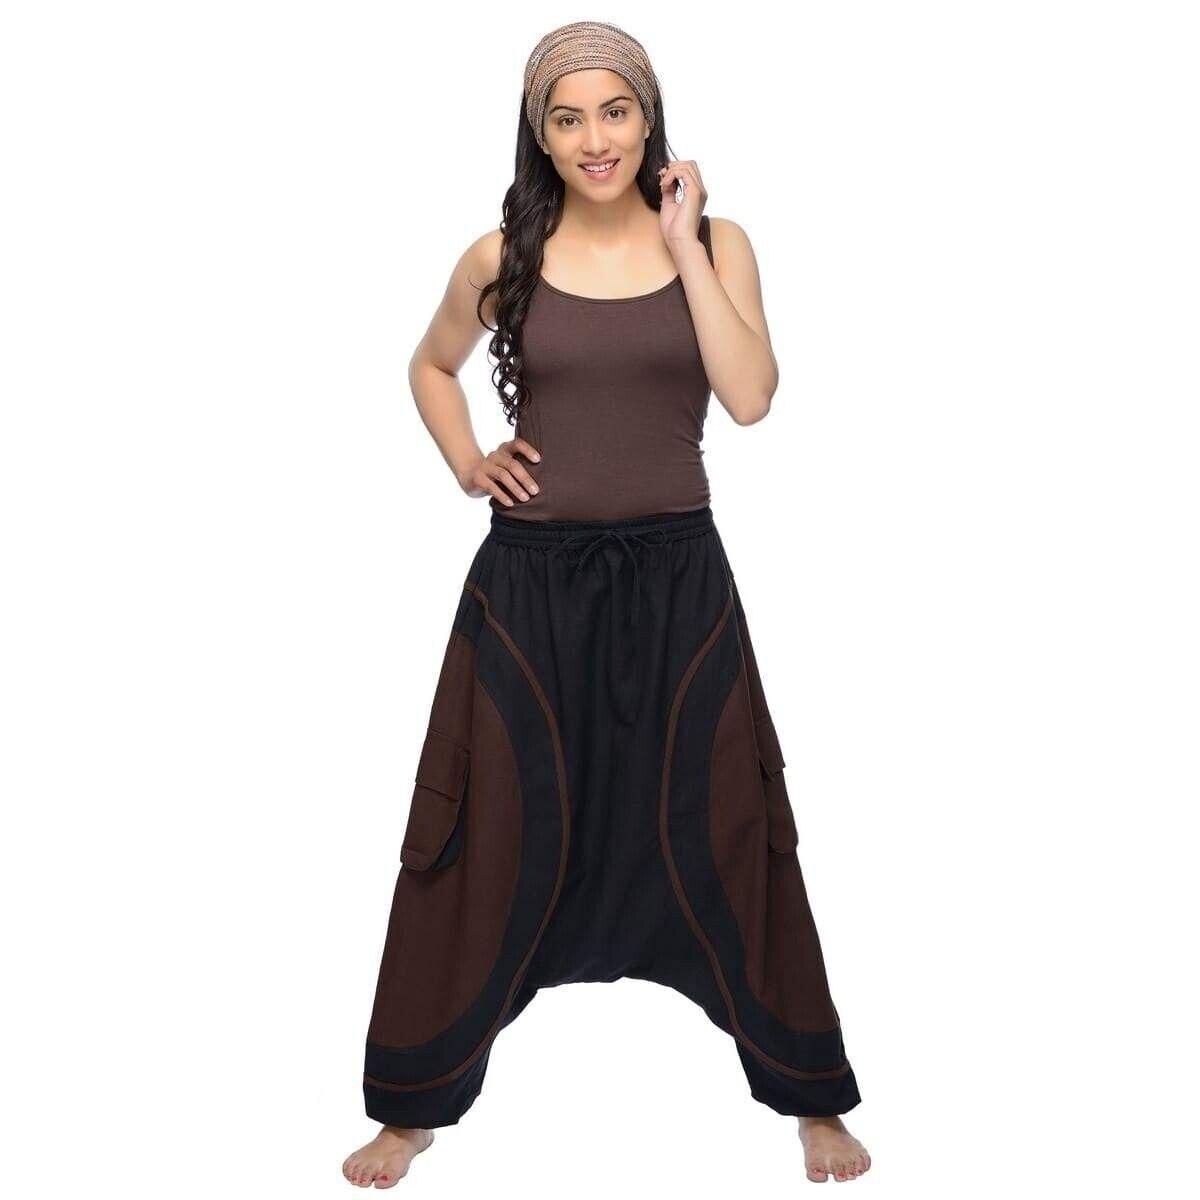 Haremshose Pumphose Aladinhose Pluderhose Yoga Goa Sarouel Baggy Freizeit Shanti